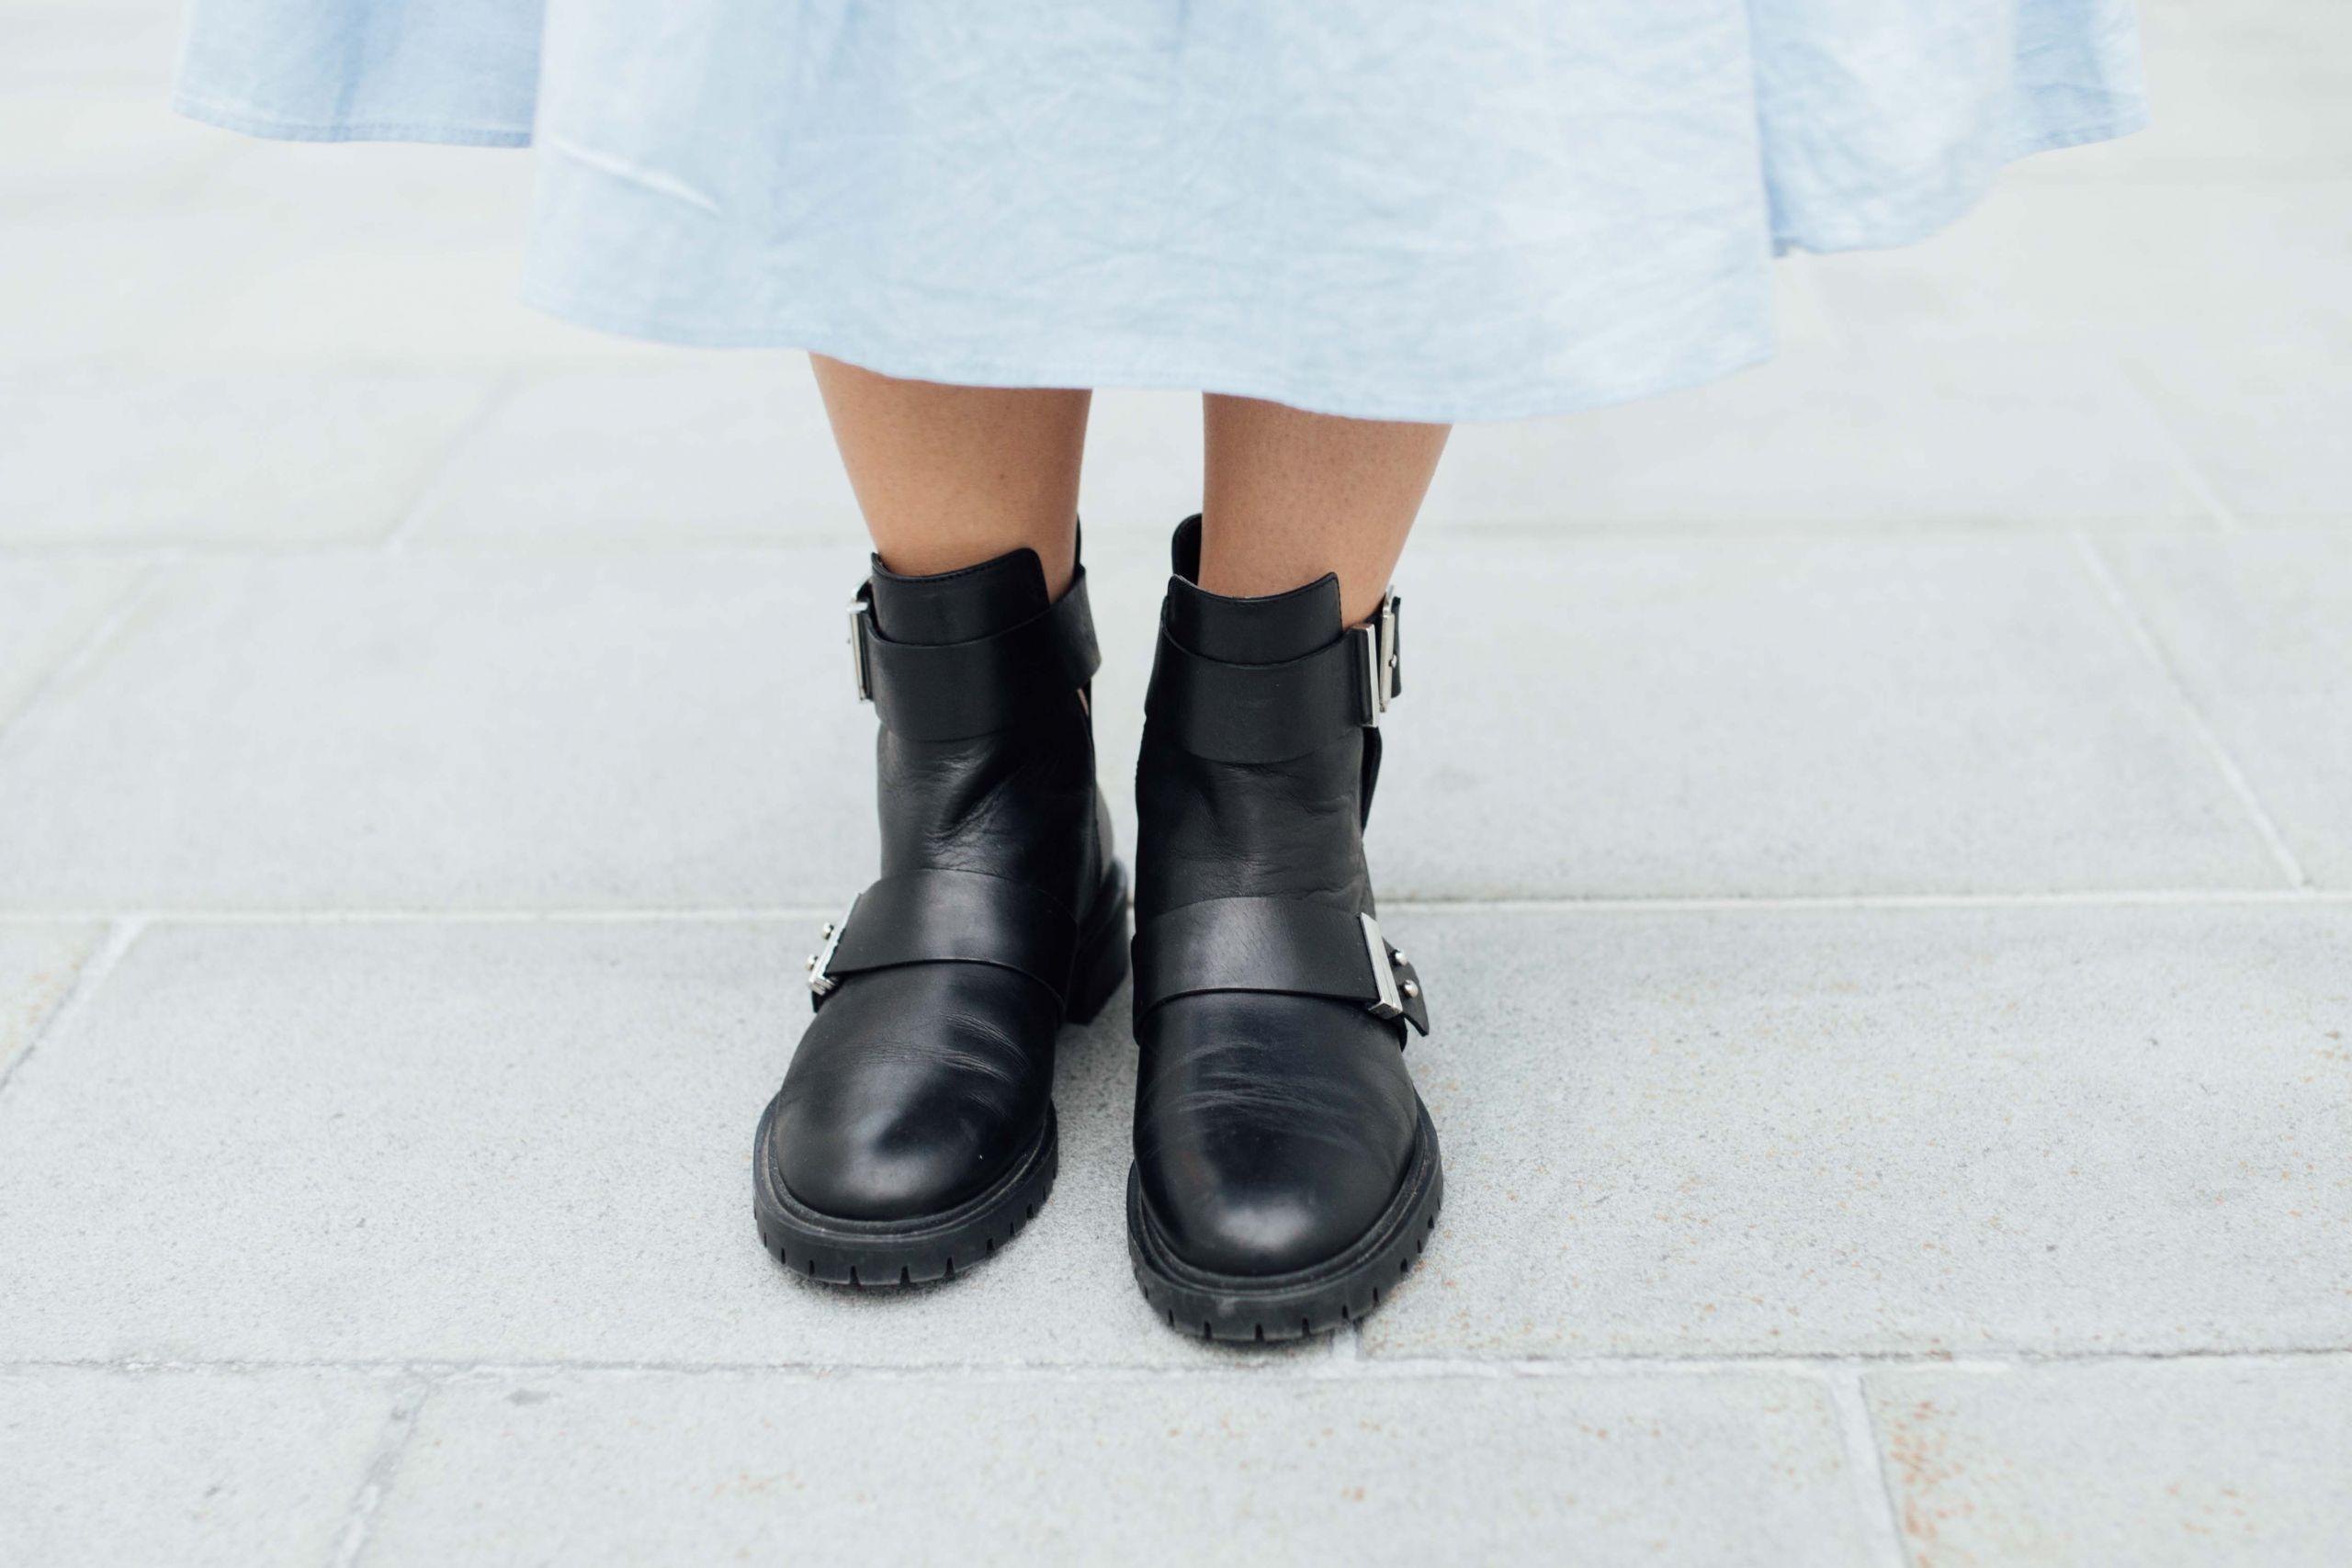 Sosodaily Fleamarket: ZARA Boots | Love Daily Dose